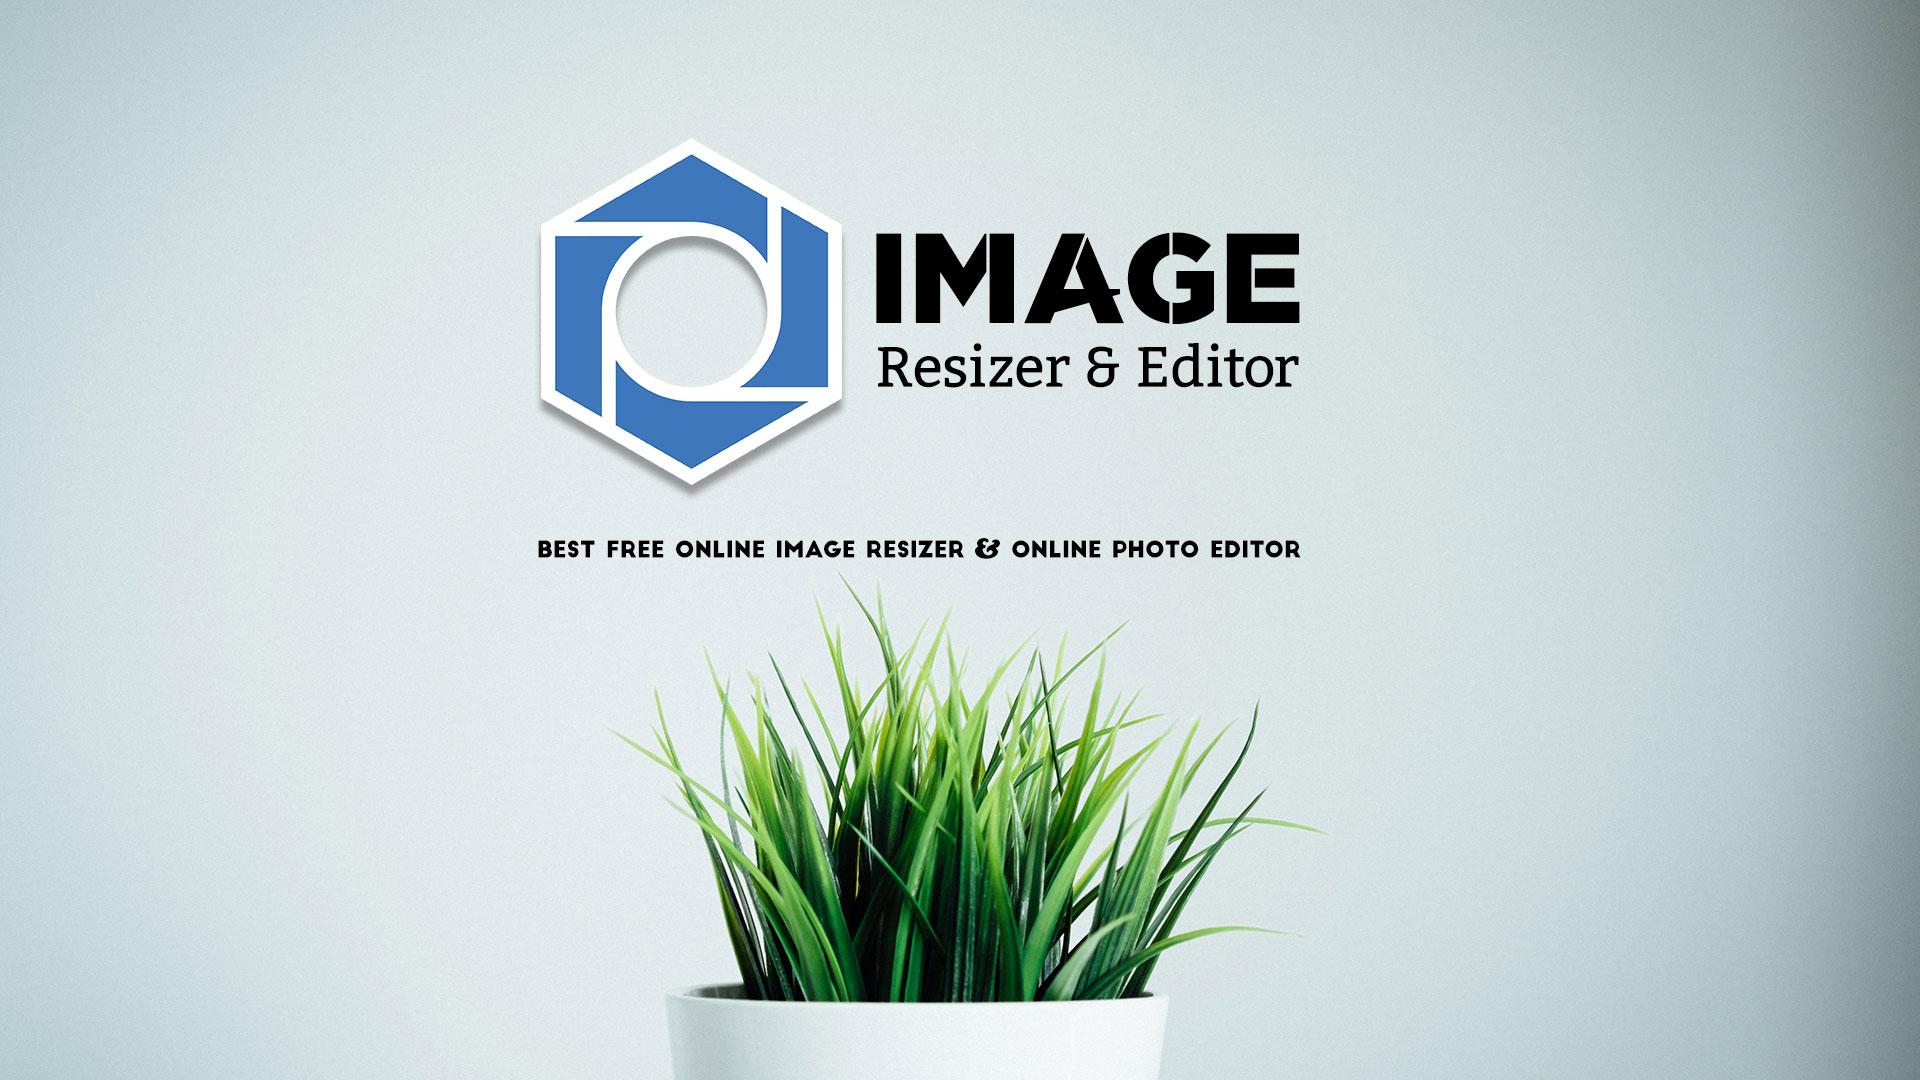 YouTube Channel Art Resizer - Online Resize Image